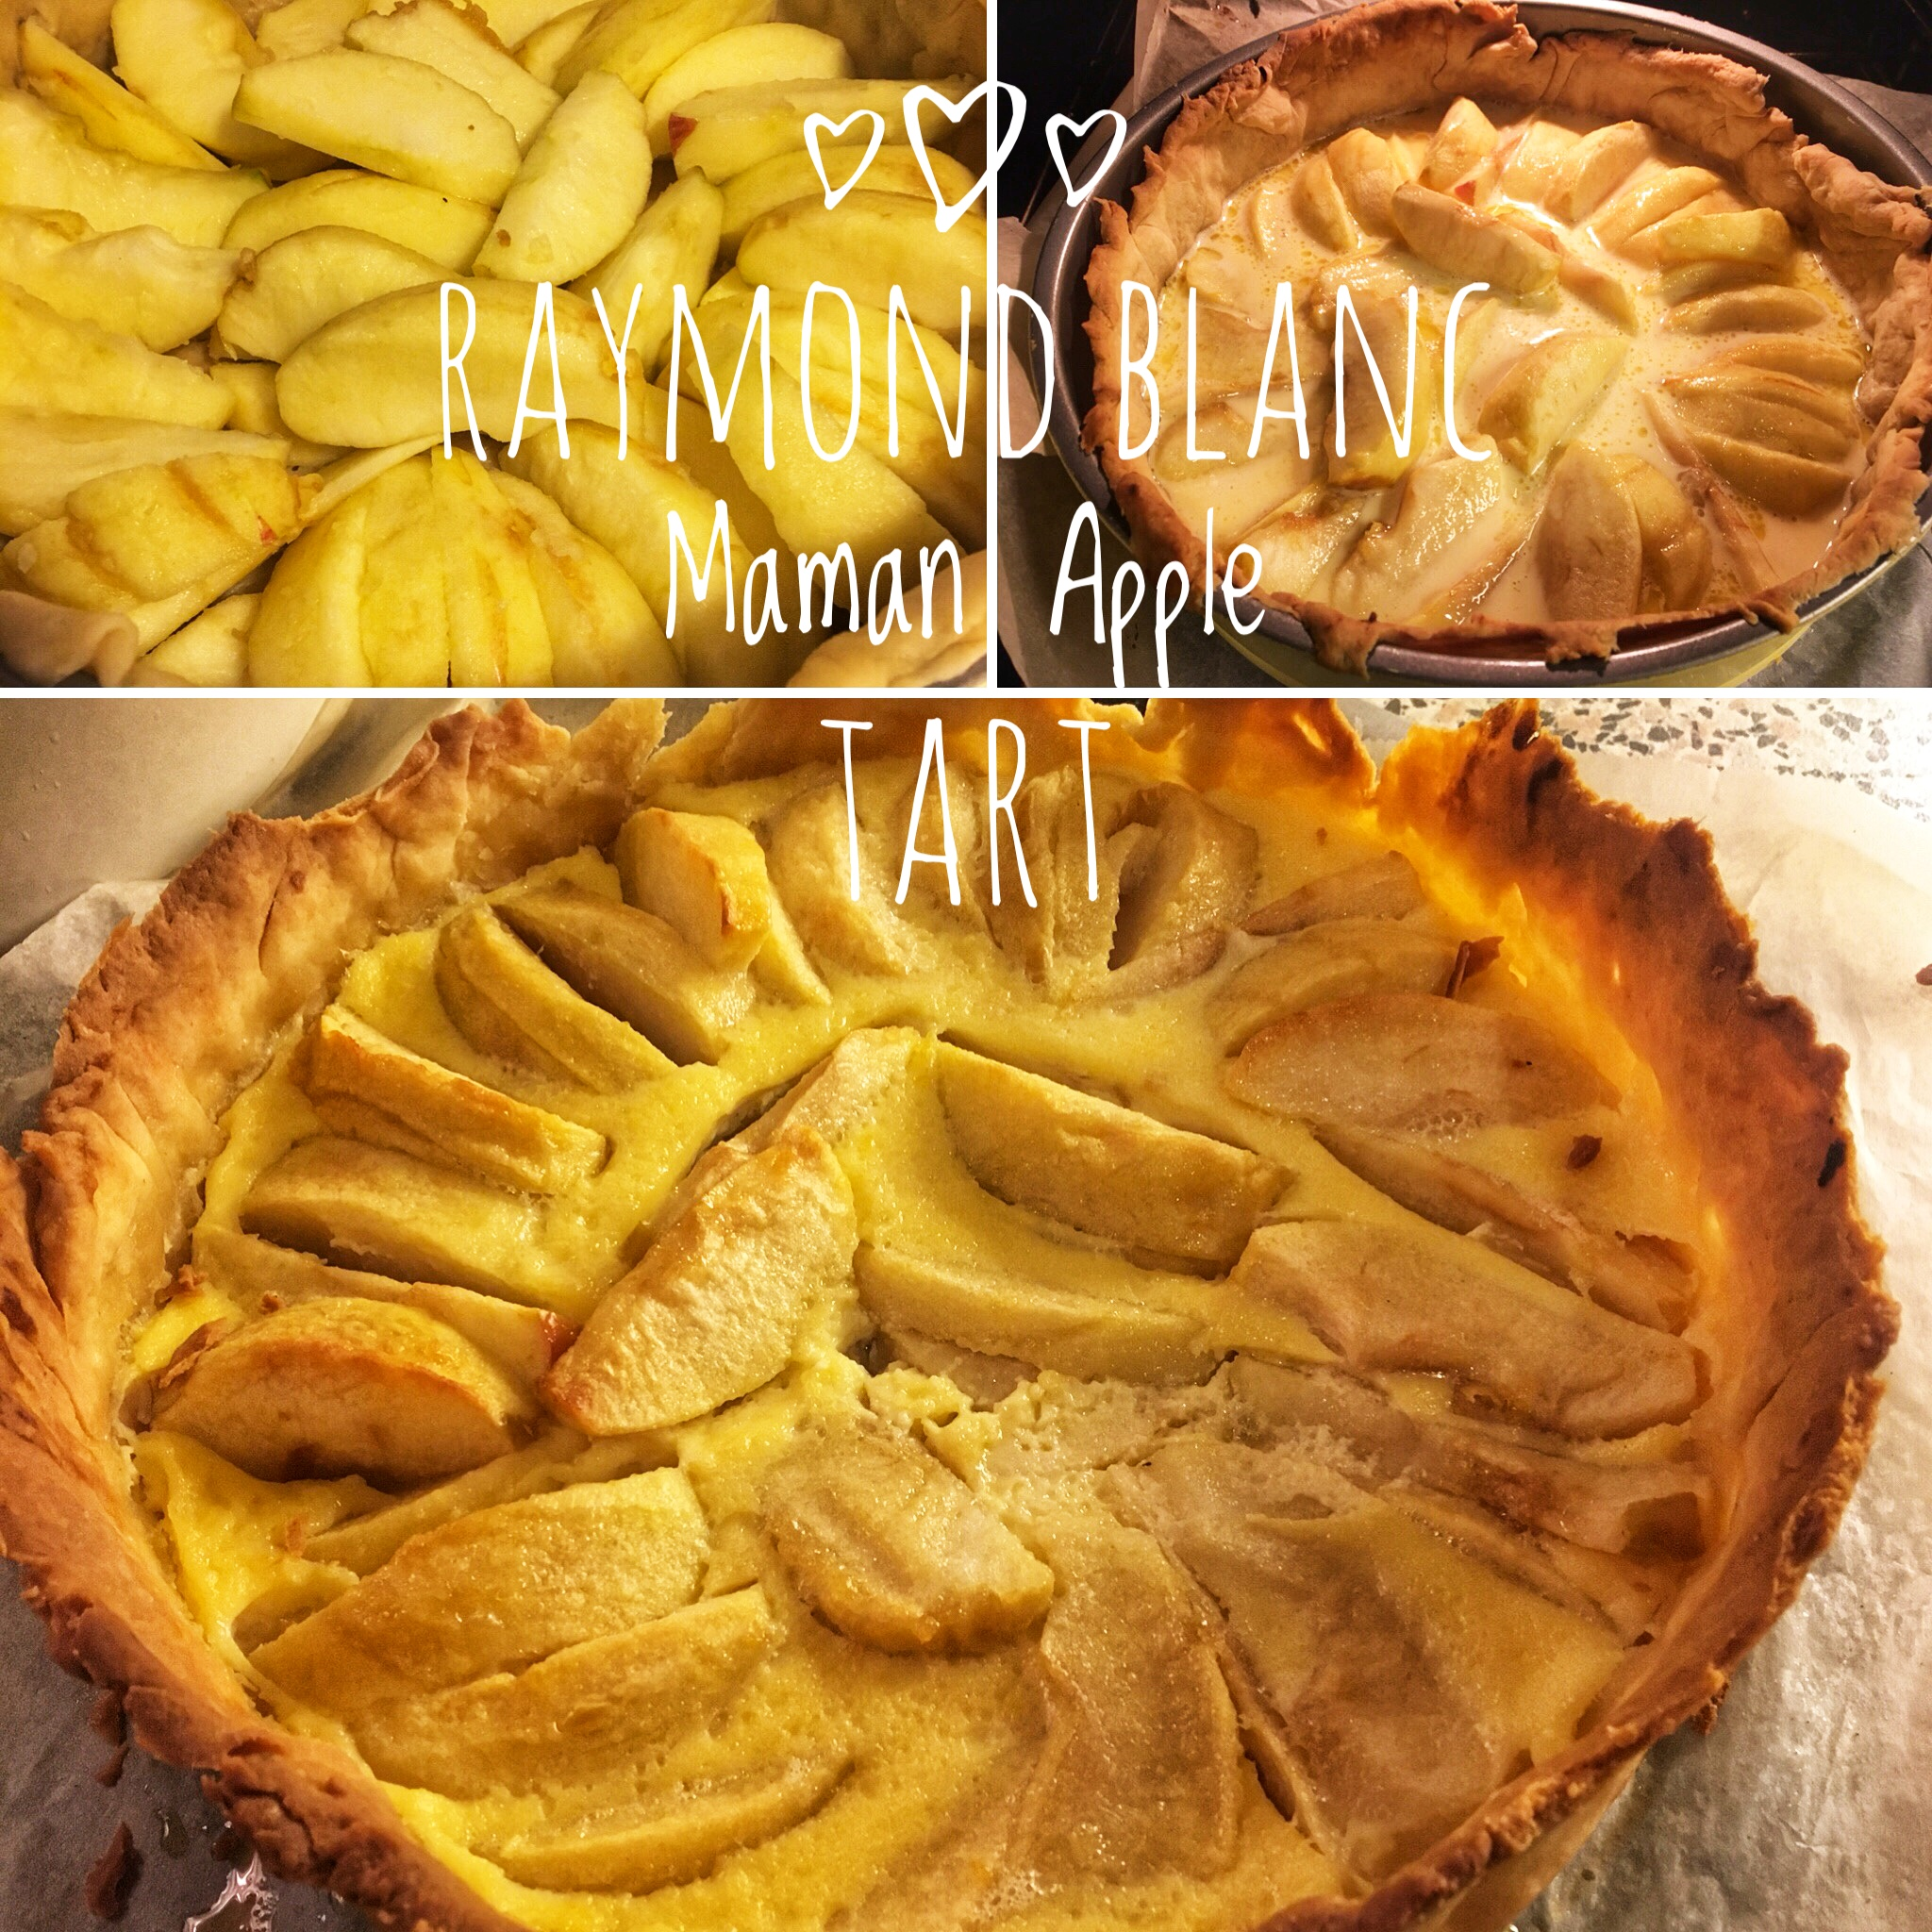 Raymond Blanc Maman Apple Tart